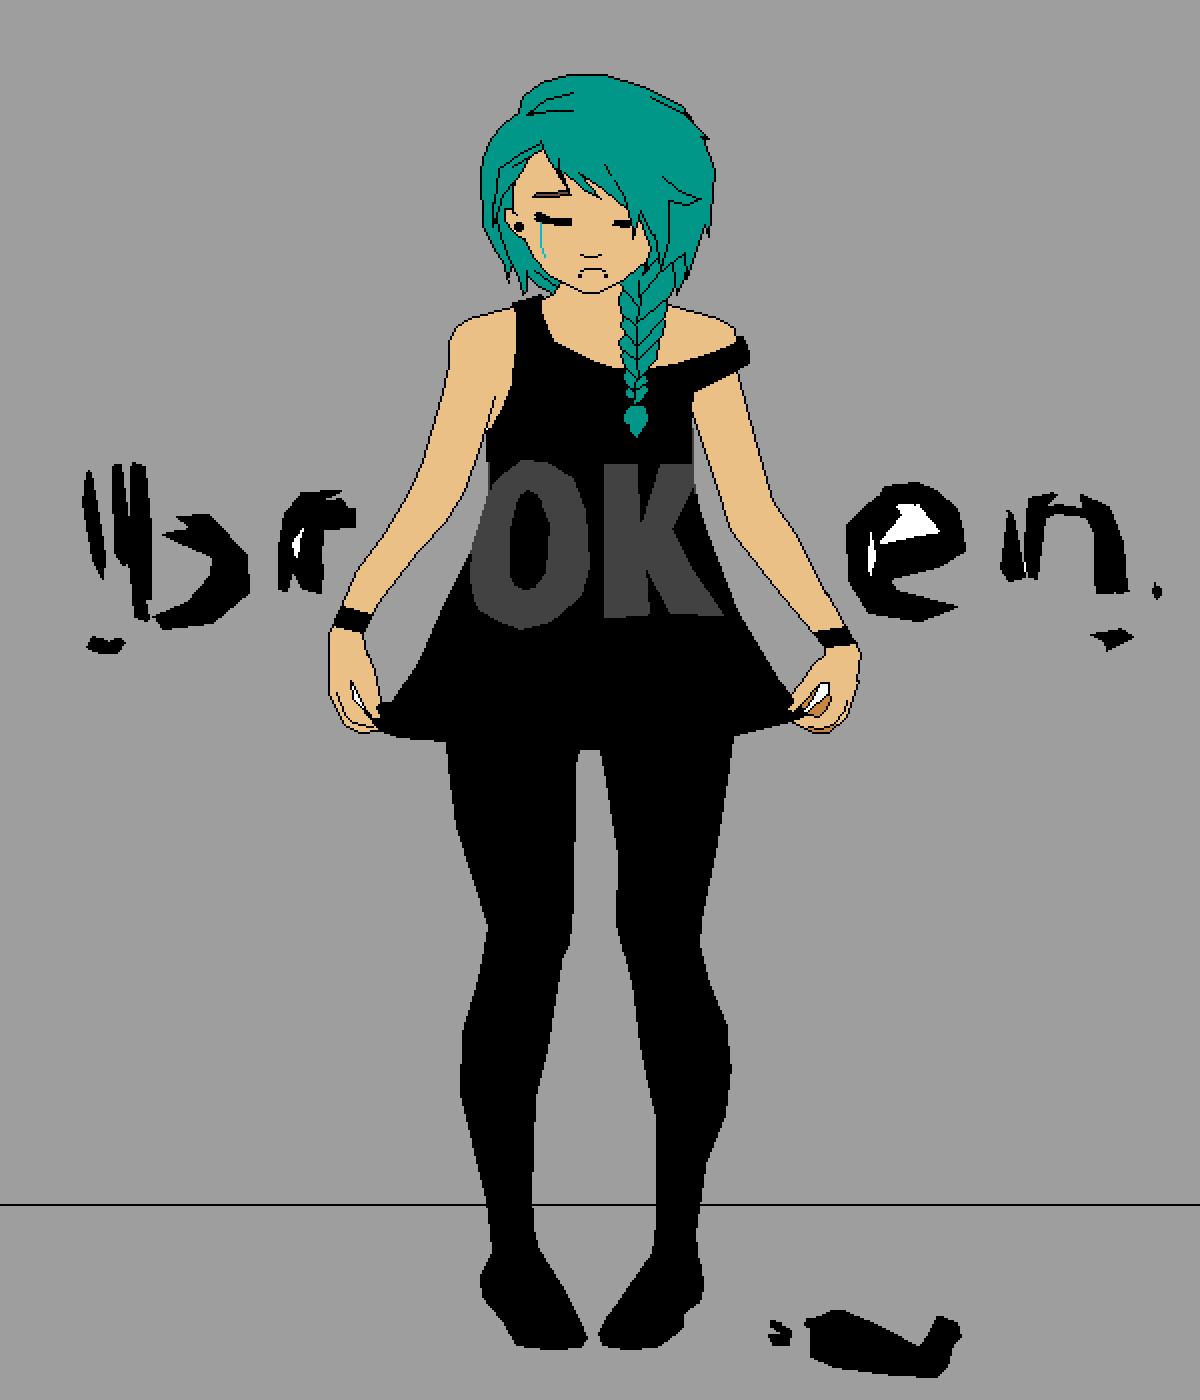 I AM brOKen by trans-boi